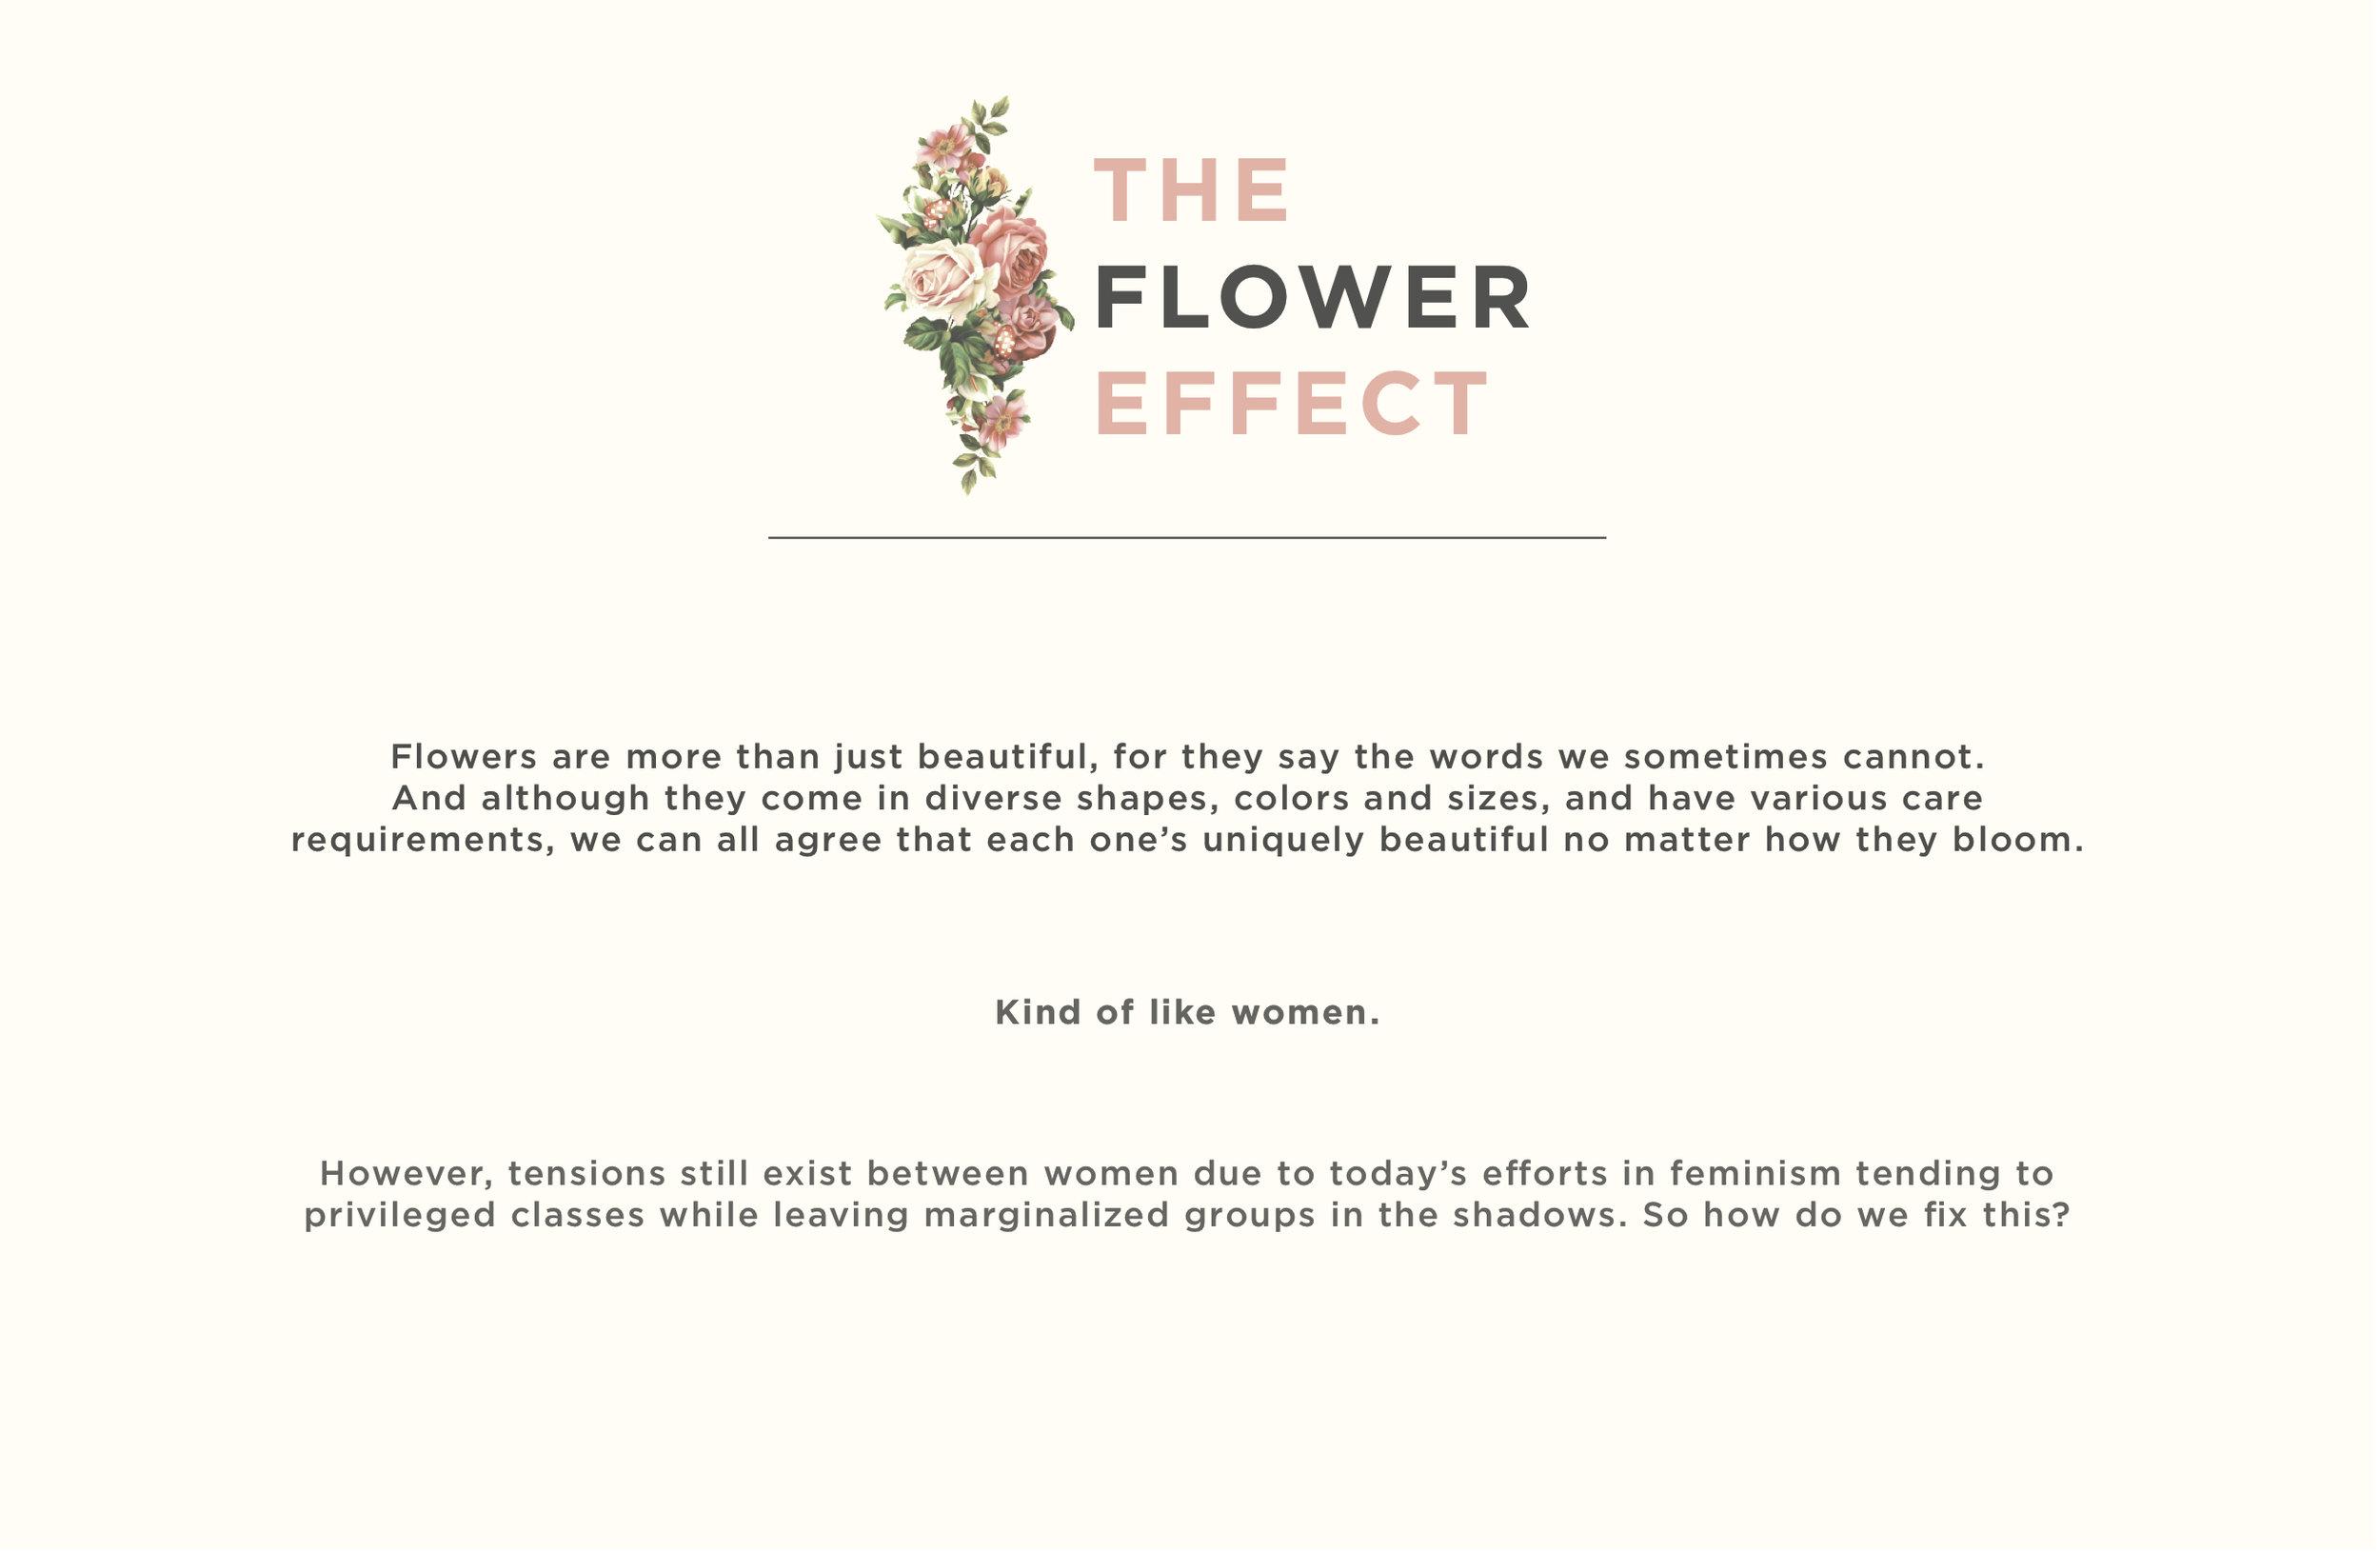 theflowereffectprint1.jpg